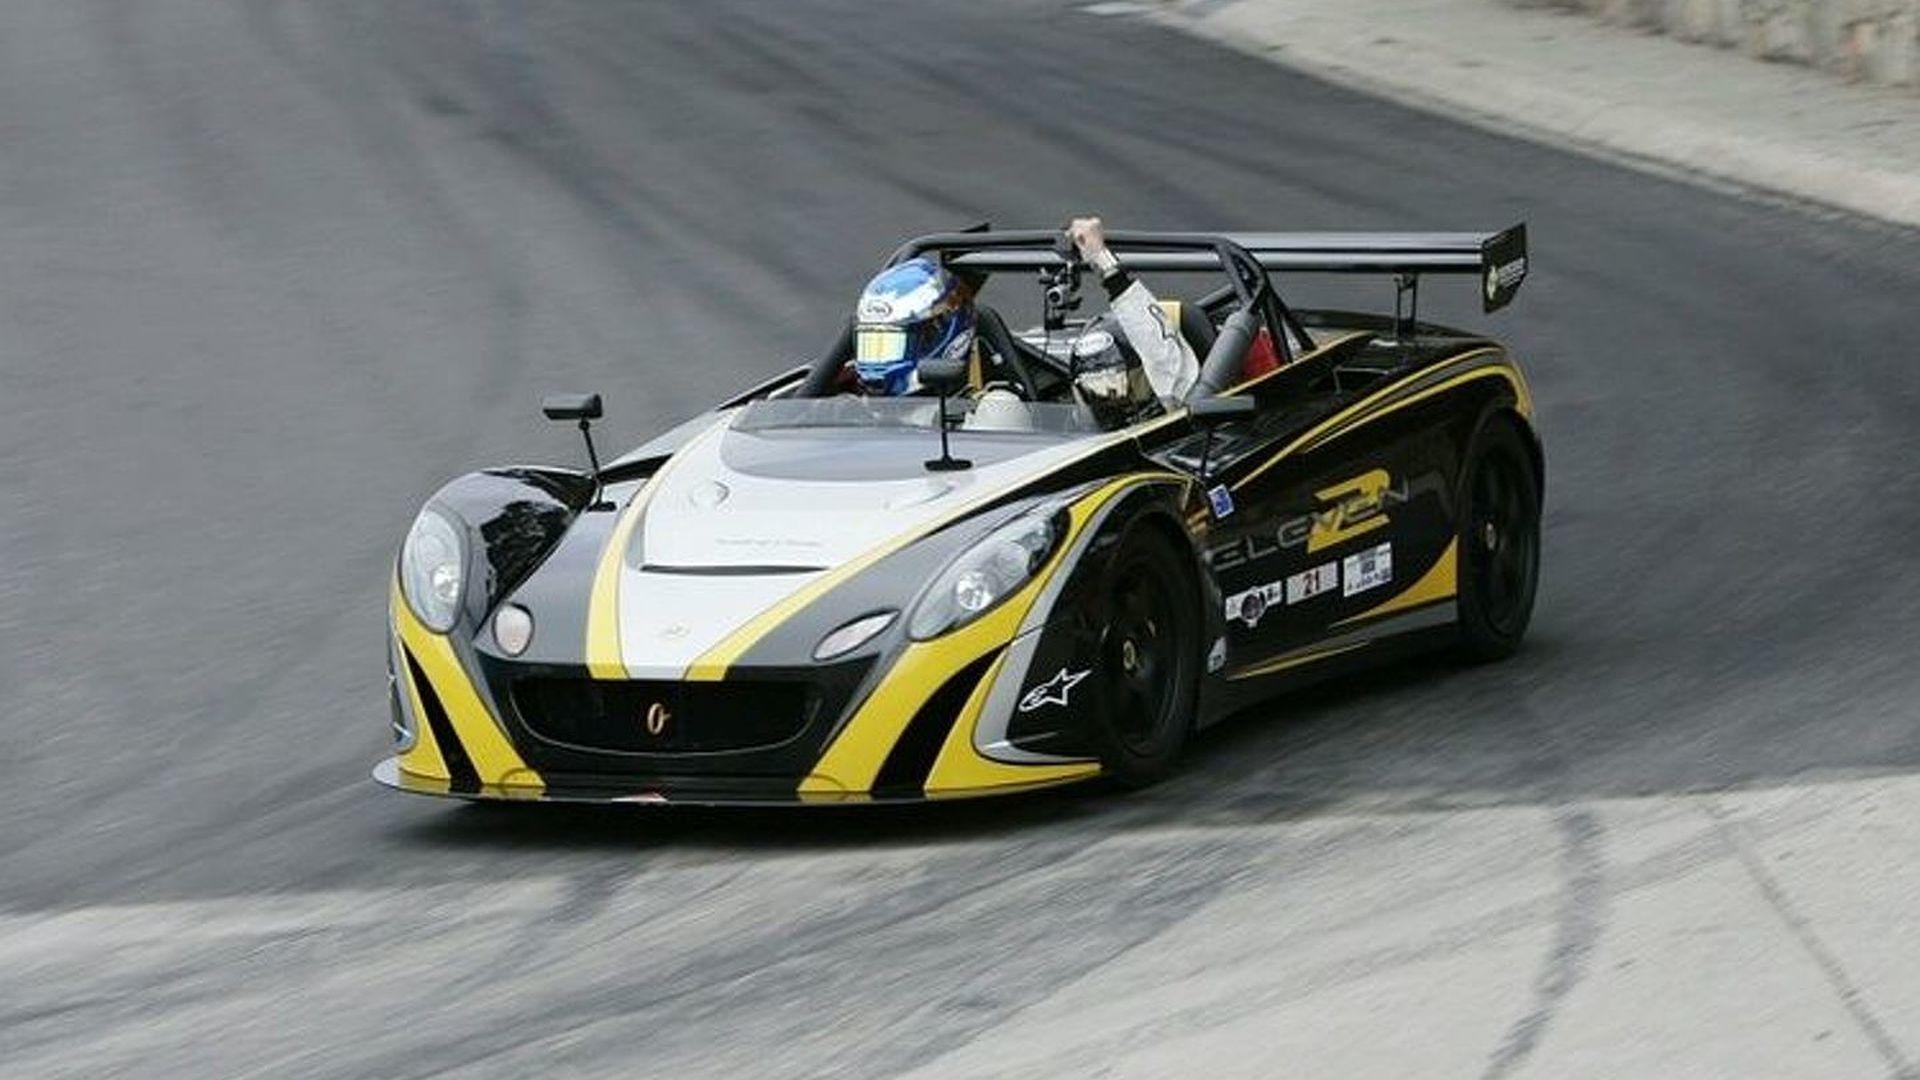 https://icdn-1.motor1.com/images/mgl/8E93/s1/2007-27614-lotus-2-eleven-at-mt-buller-sprint1.jpg